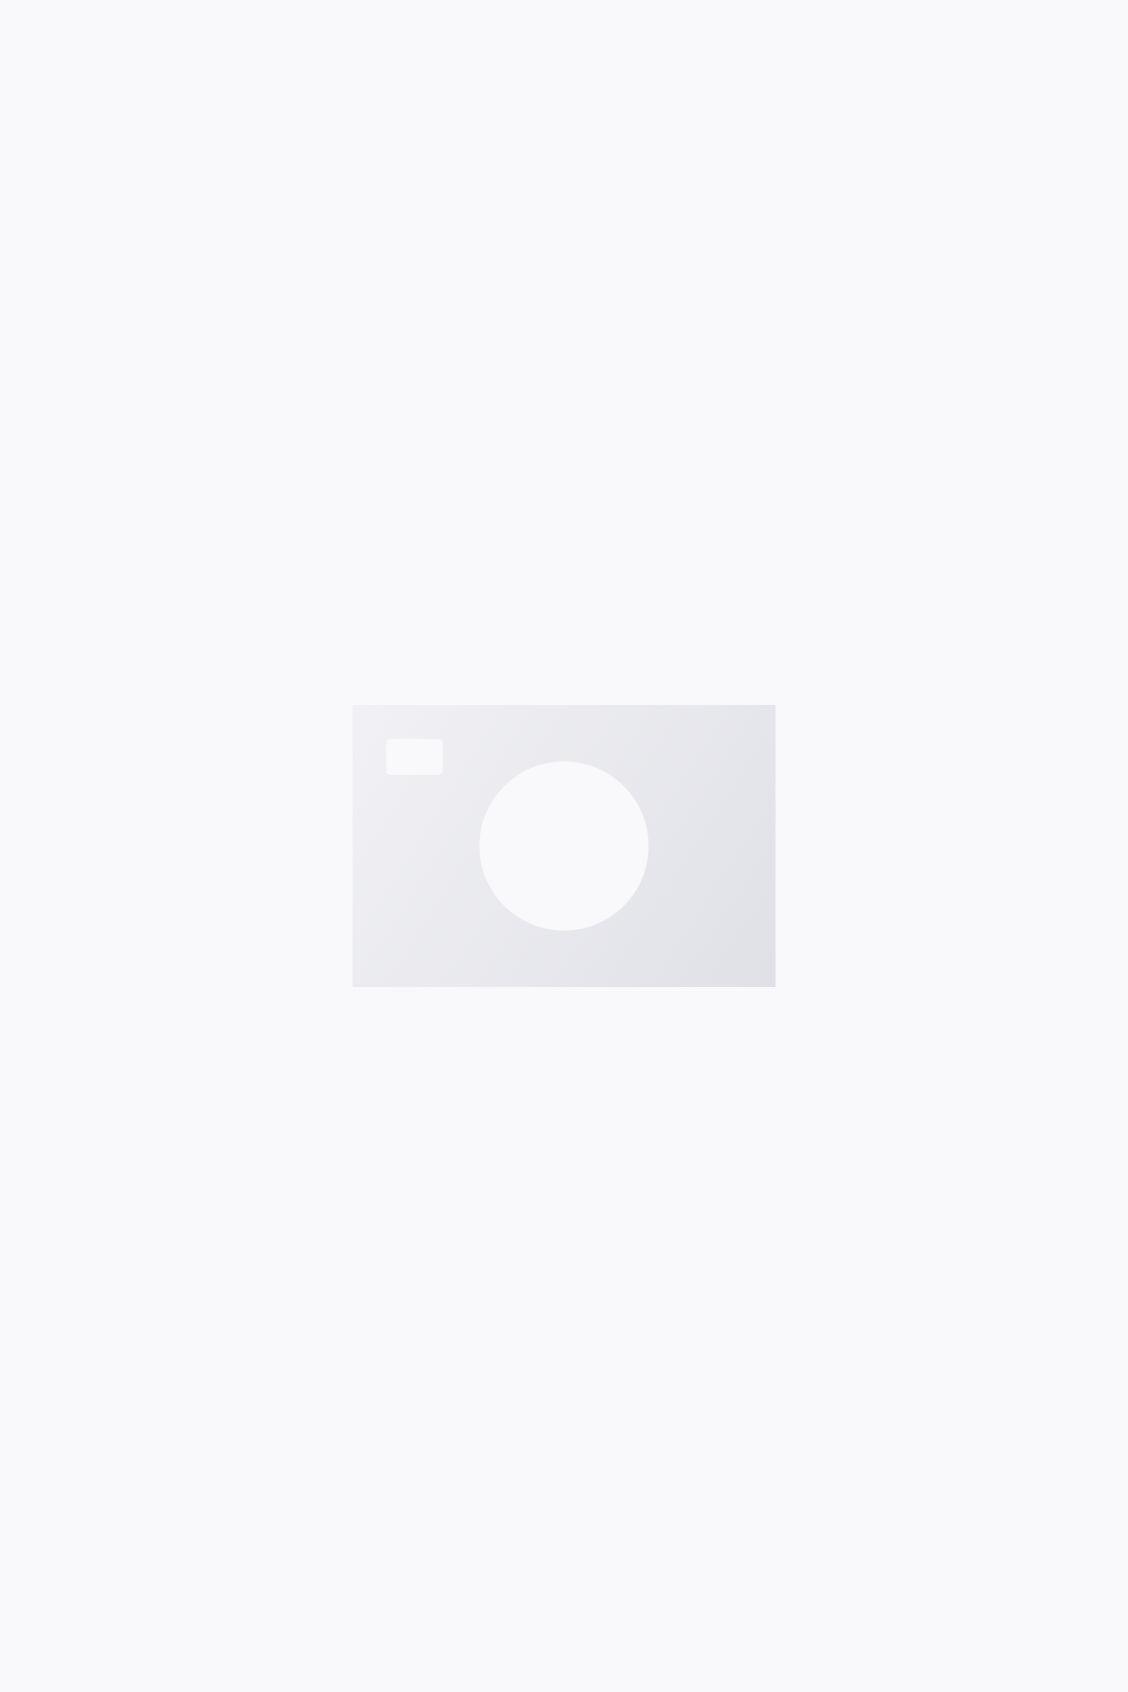 COS RUFFLED TUNIC DRESS,BLACK